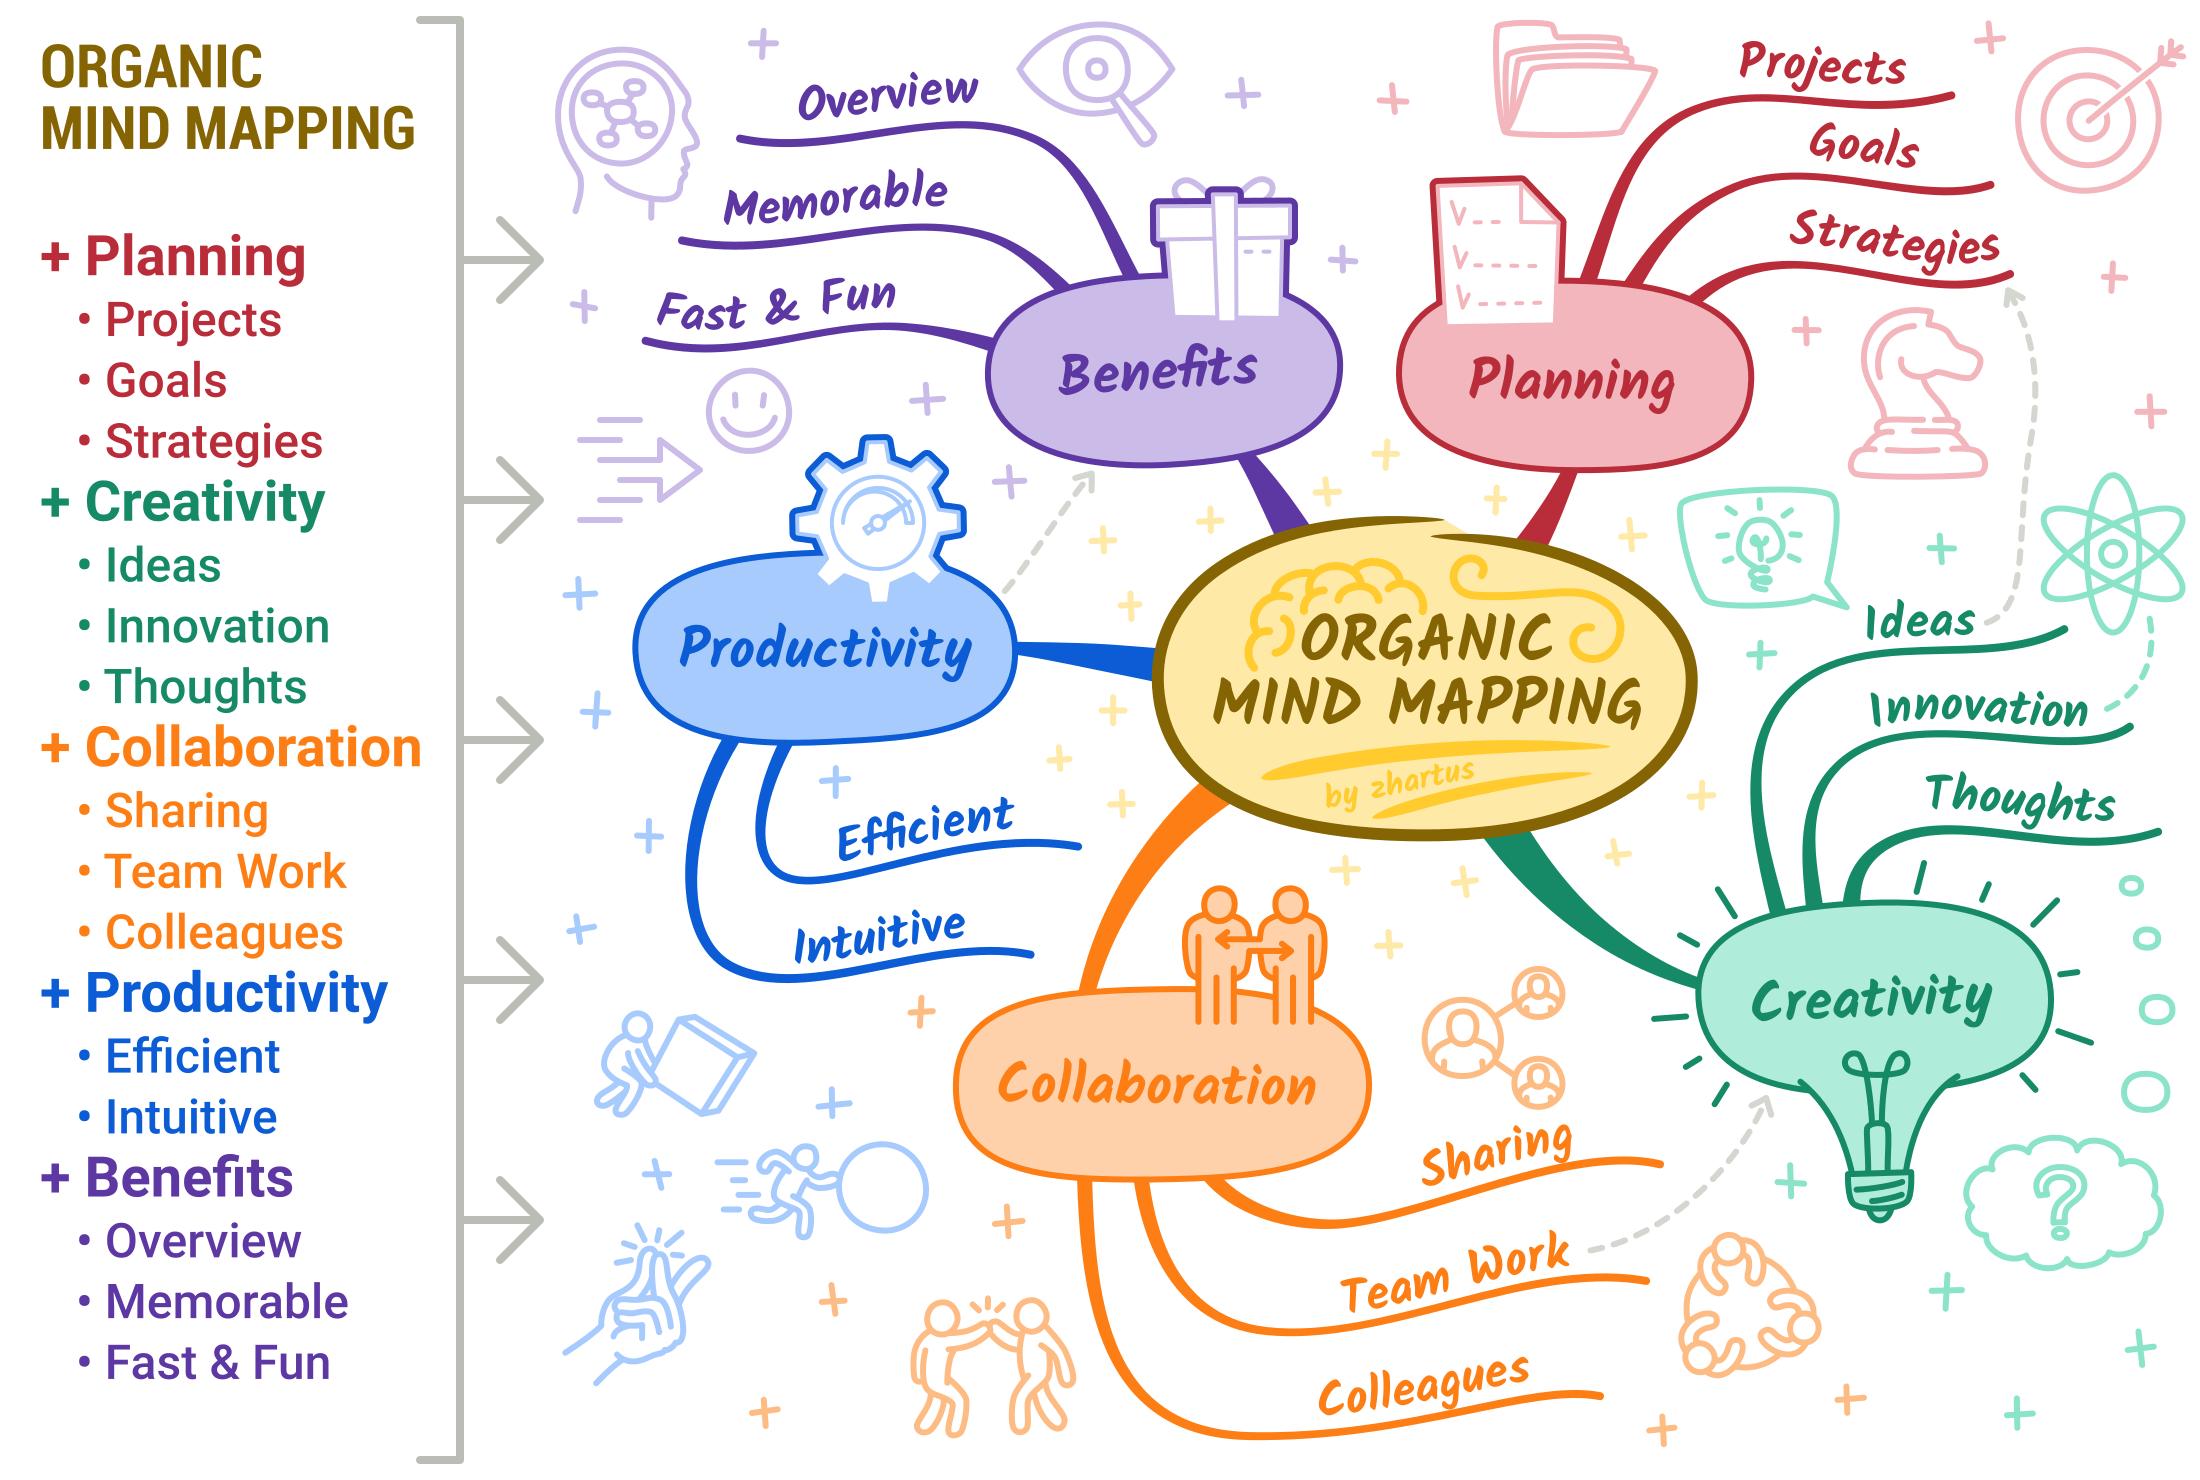 Organic Mind Mapping